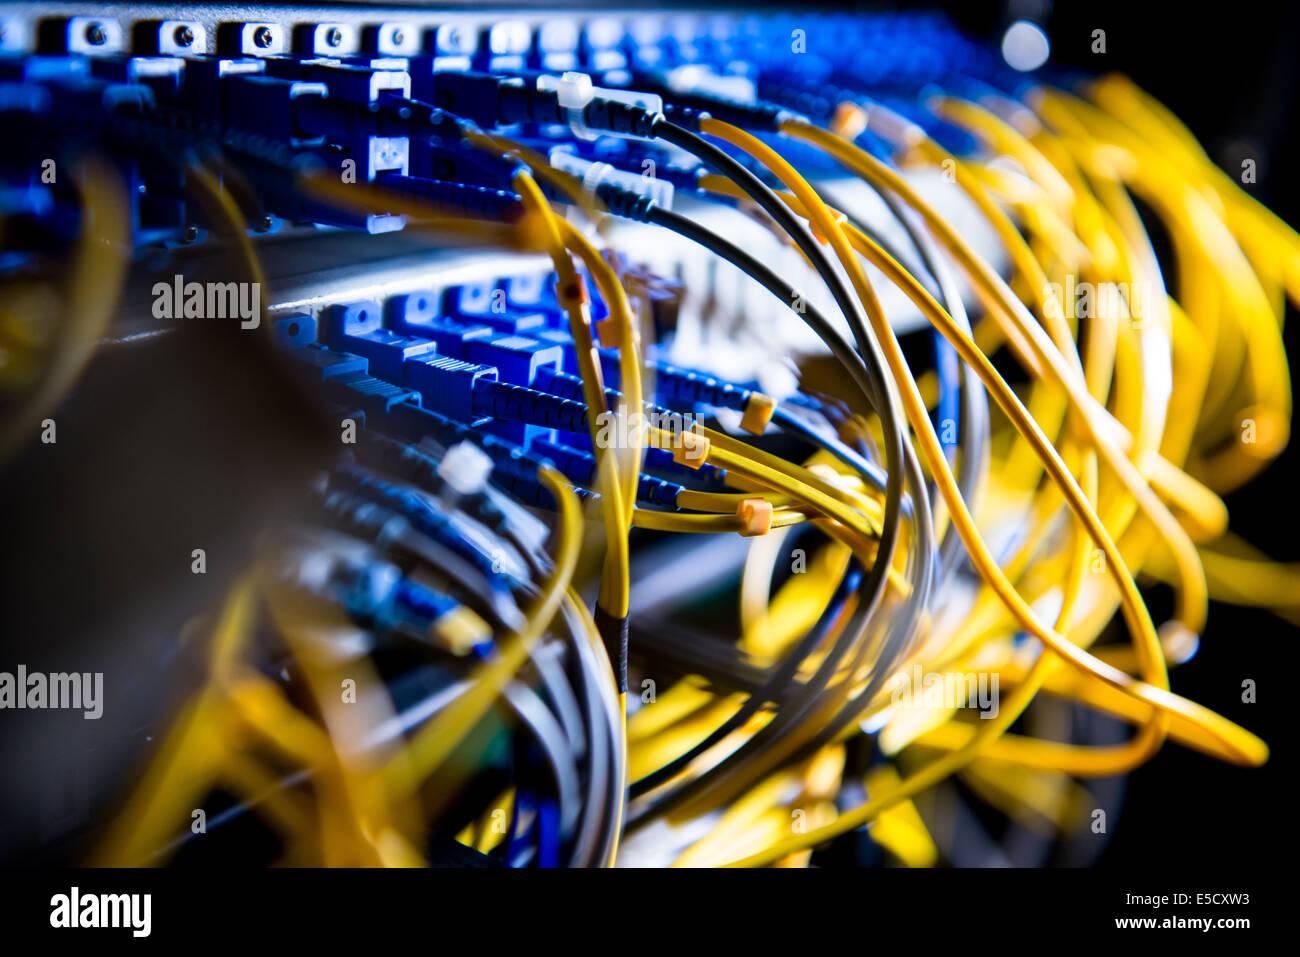 Fiber-optic equipment in a data center Stock Photo